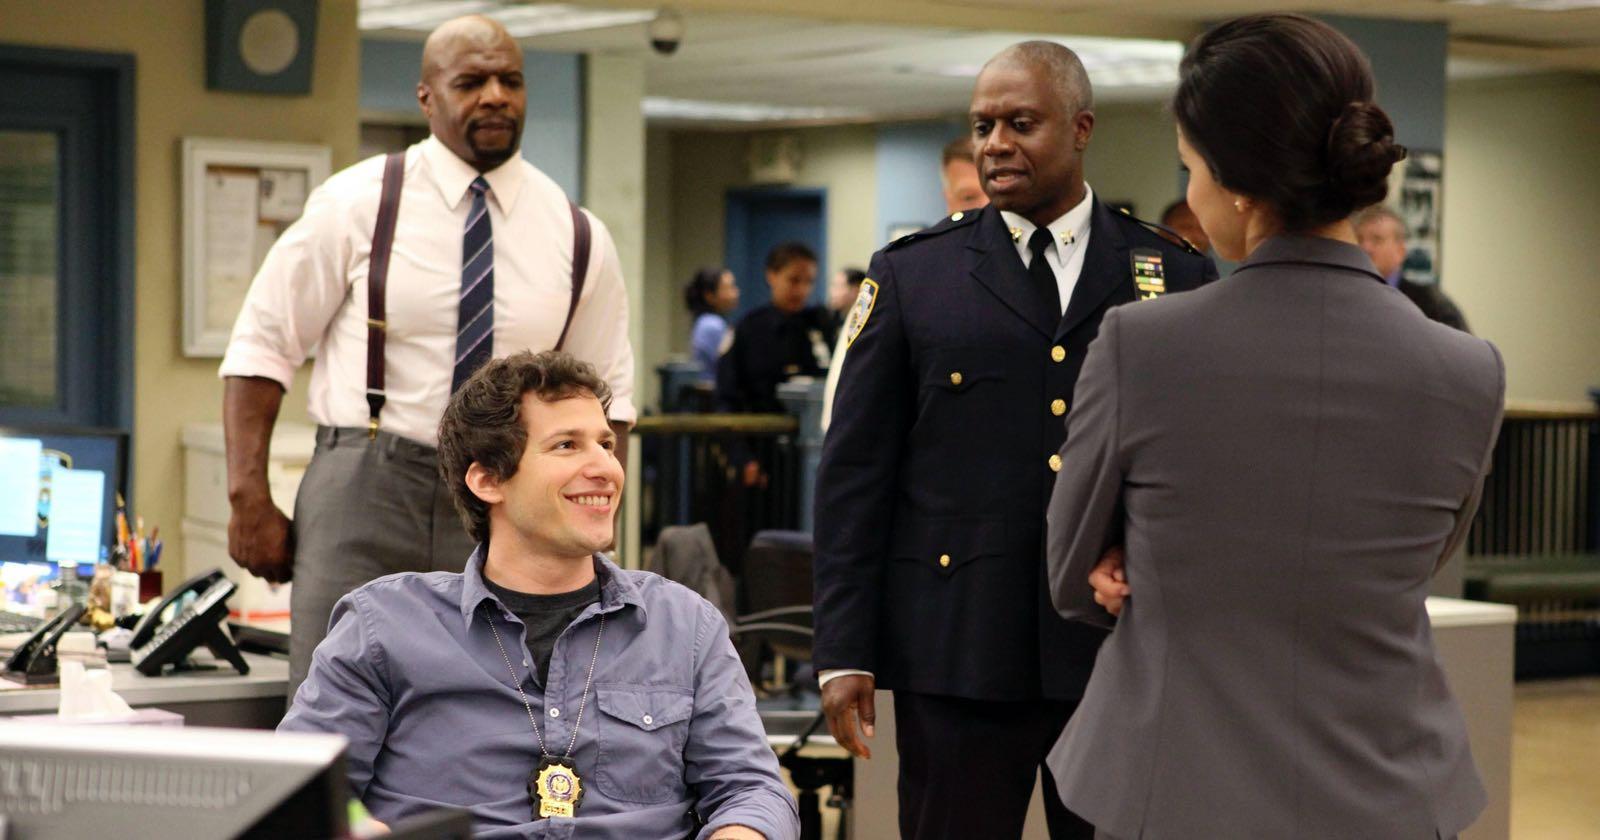 Personajes de la serie Brooklyn 99